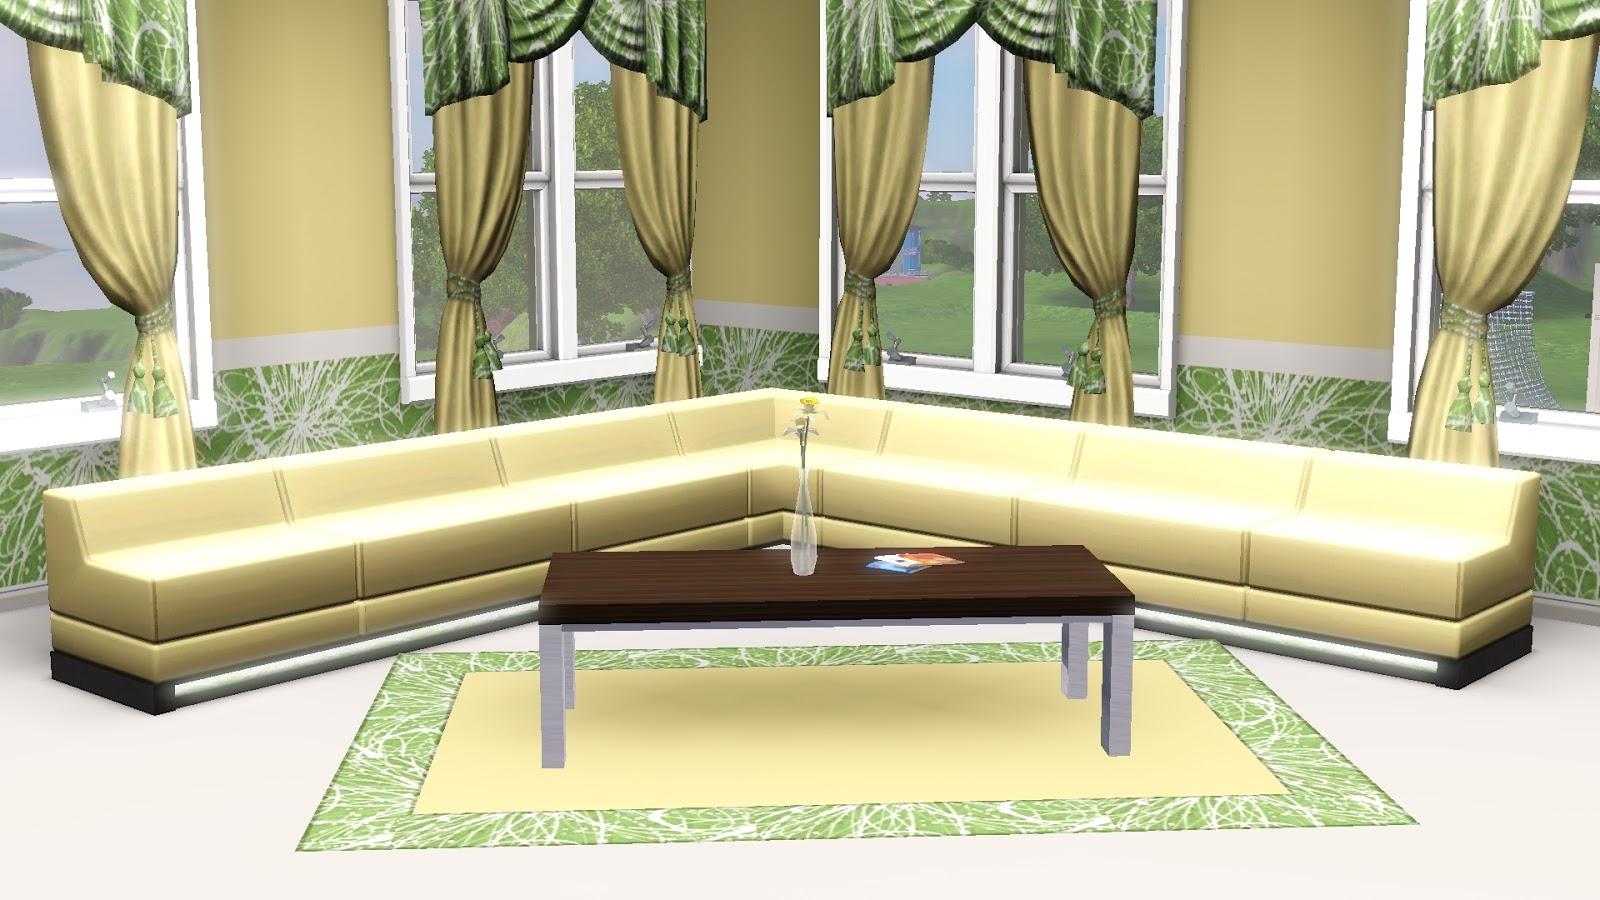 19 Sims 3 Blog Klubbo Couchtisch + 1 Mesh